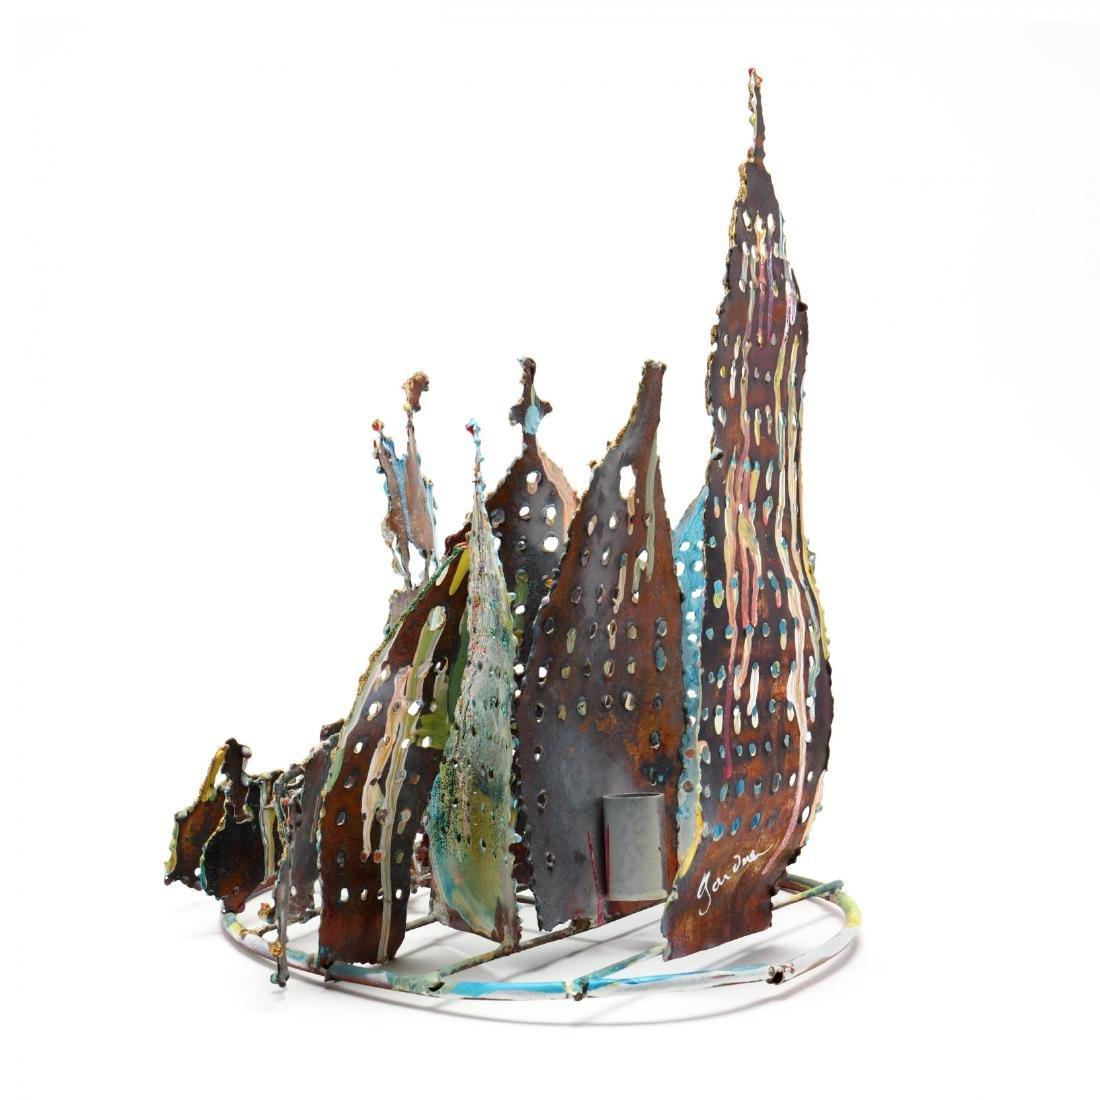 Folk Art Painted Metal Sculpture of New York City - 4